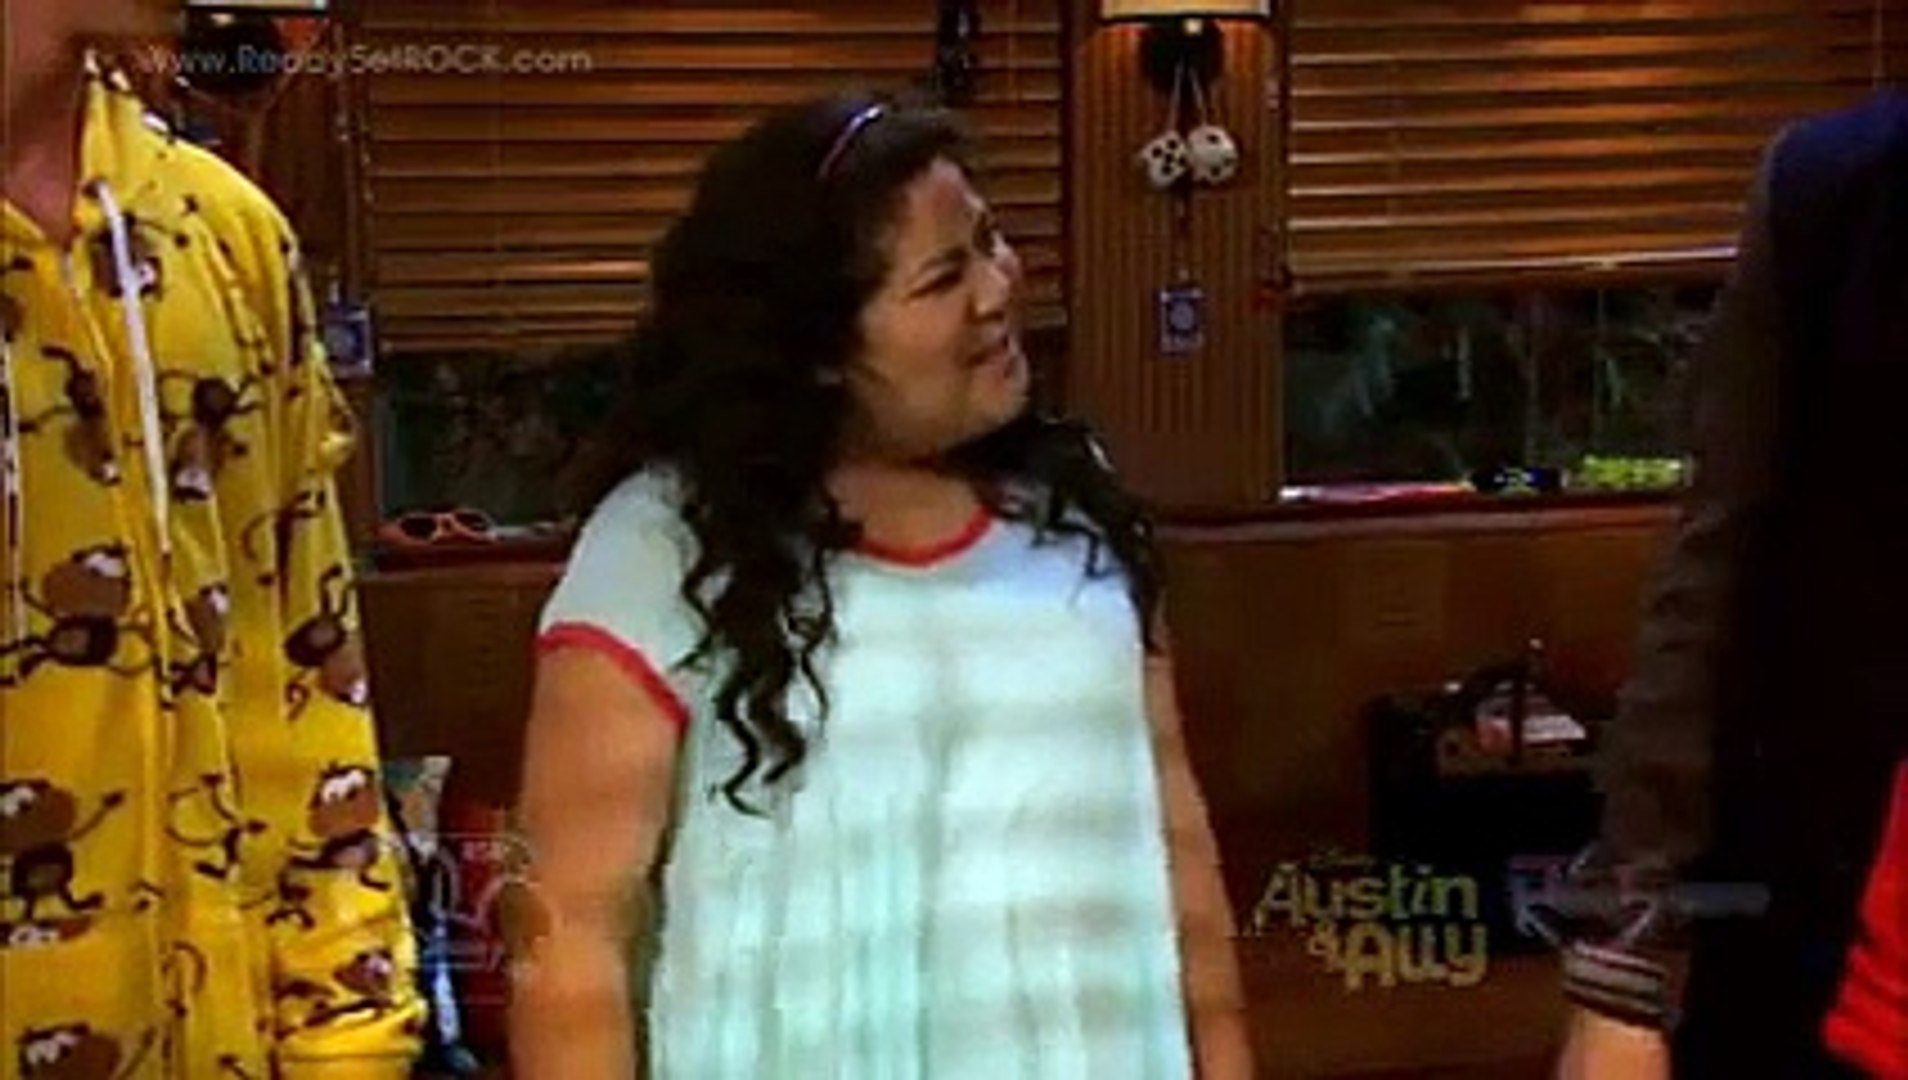 Austin & Ally - Presidents & Problems Clip [HD]